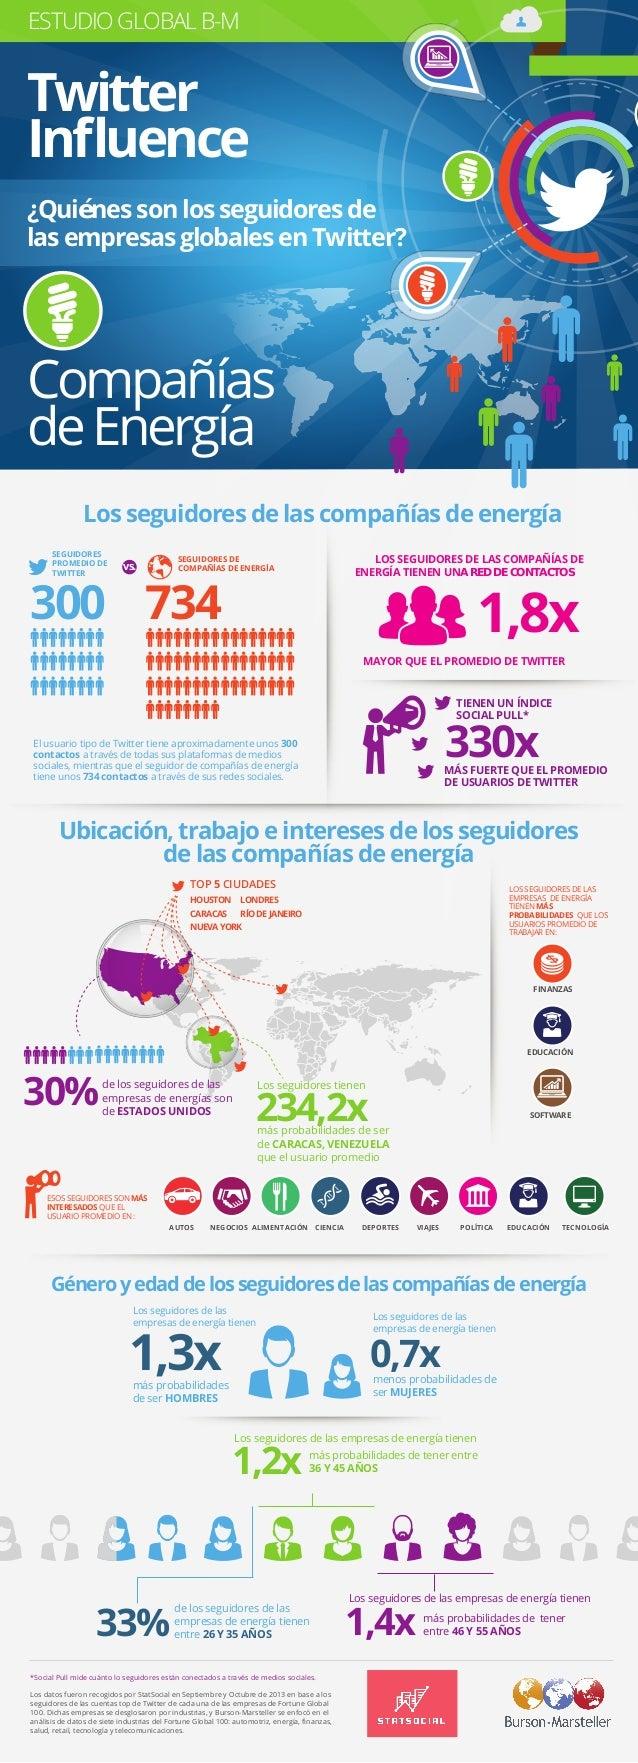 Estudio Global B-M Twitter Influence - ENERGÍA